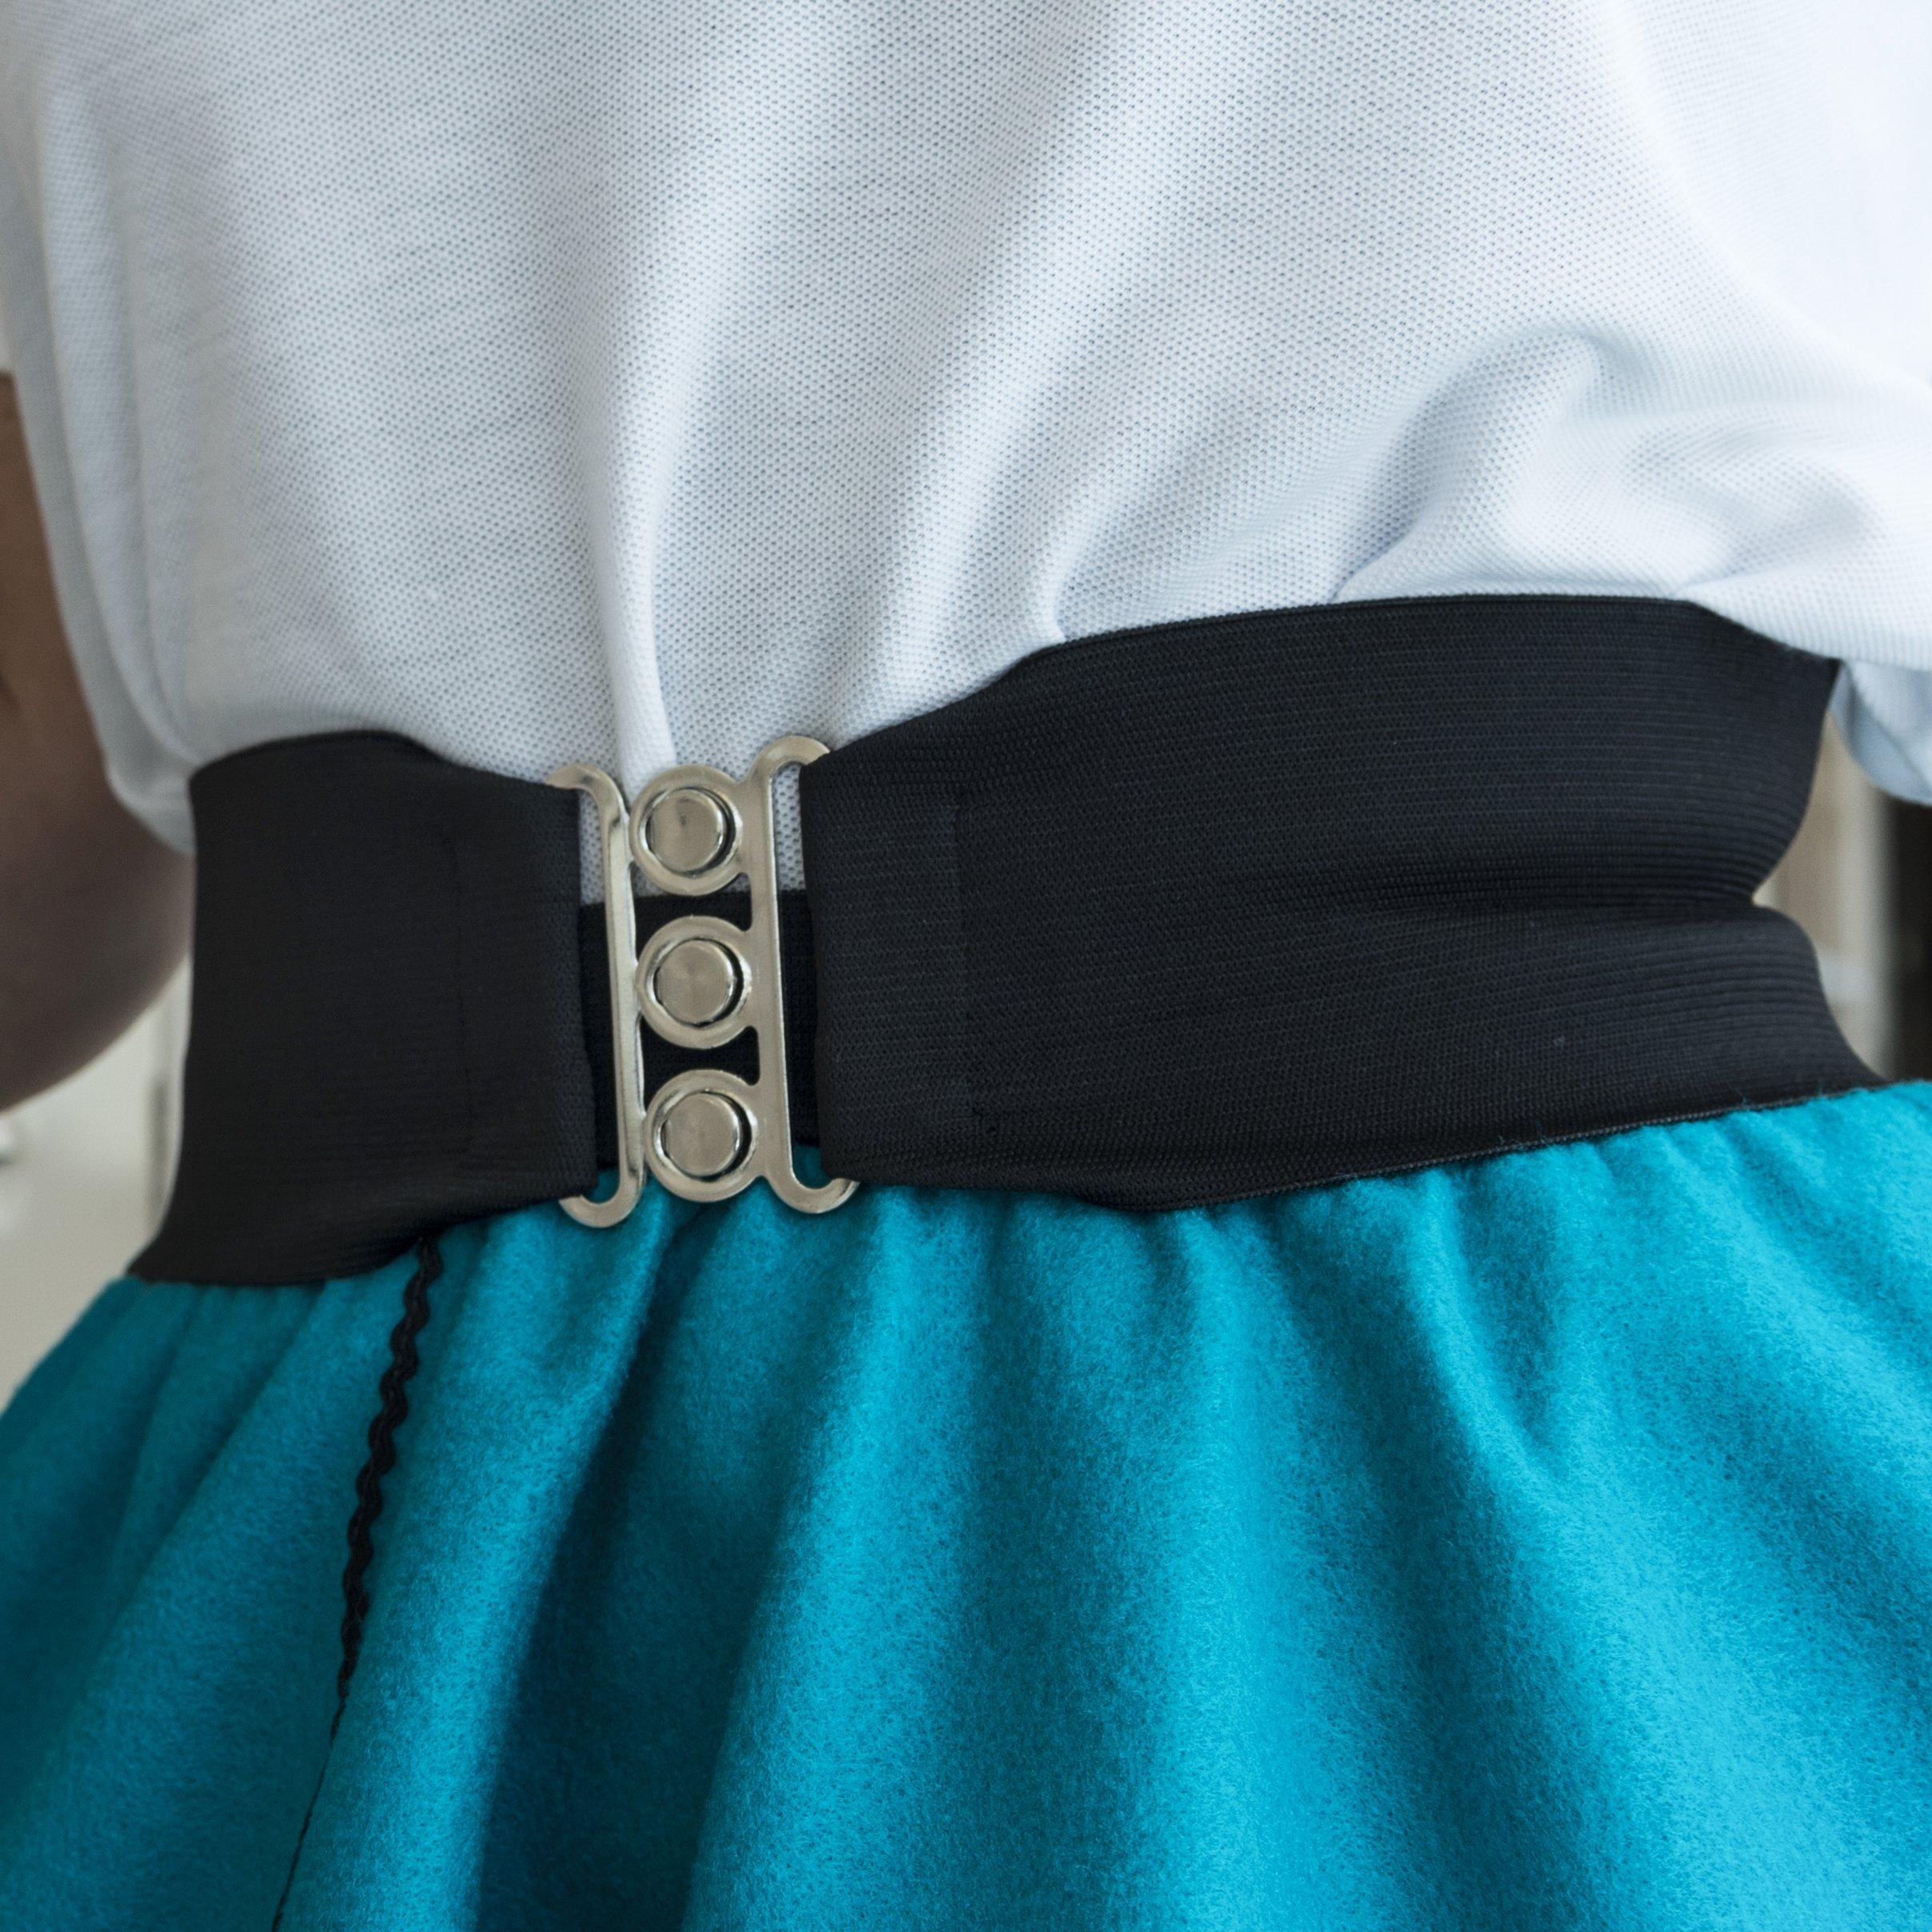 "Silver Clasp 50s Style Cinch 3"" Wide Elastic Belt for Women Junior and Plus Sizes Black M/L by Hip Hop 50s Shop (Image #3)"